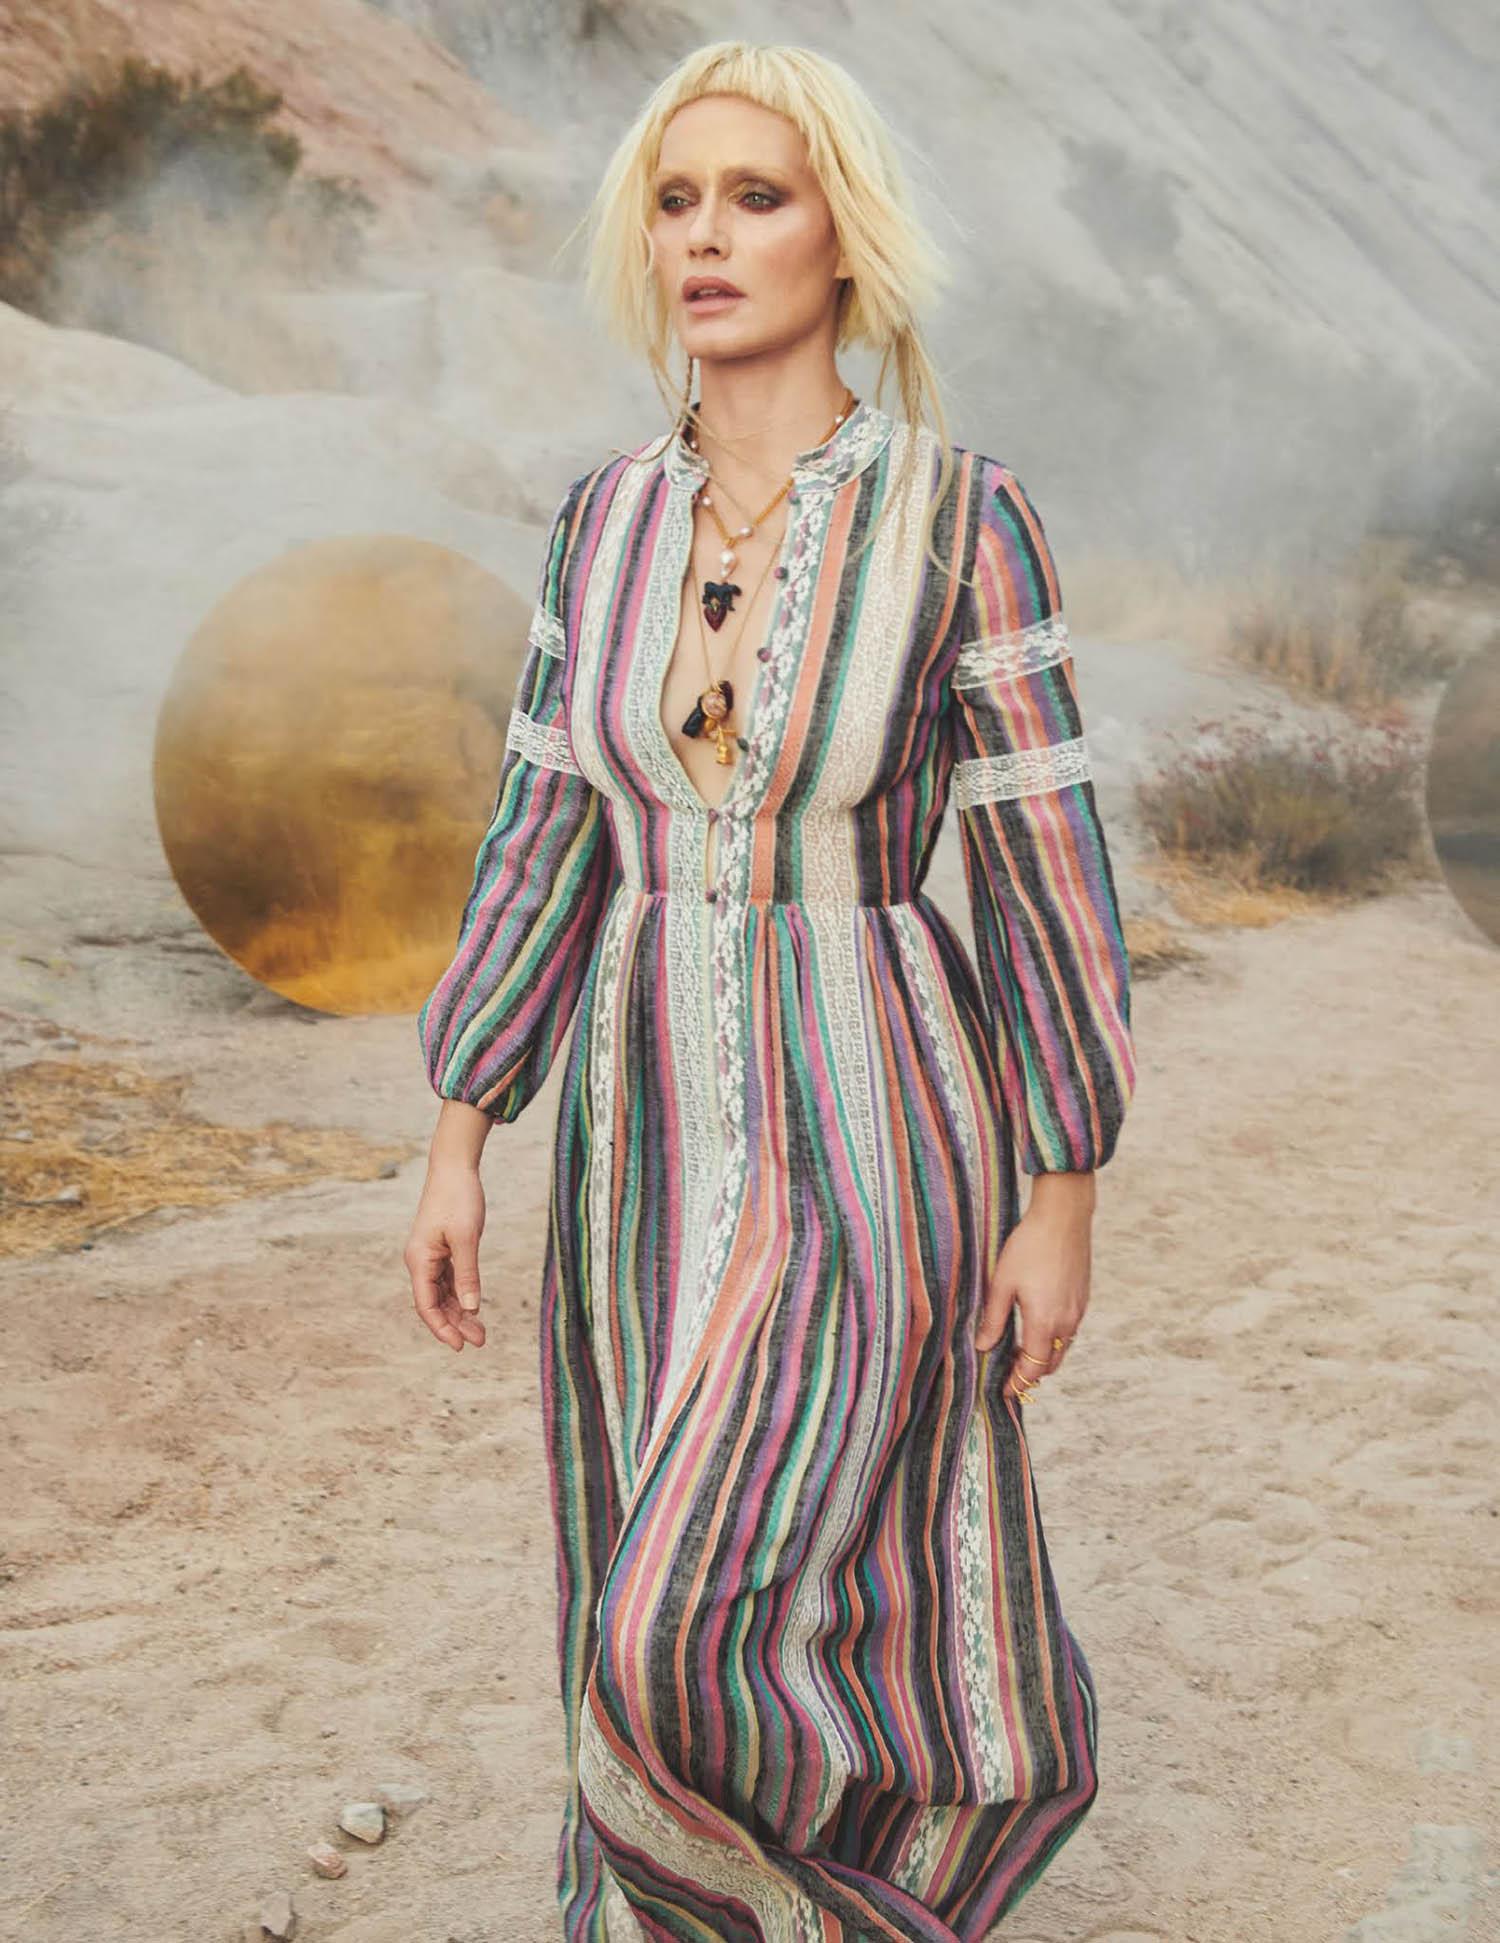 Amber Valletta by Craig McDean for British Vogue April 2021